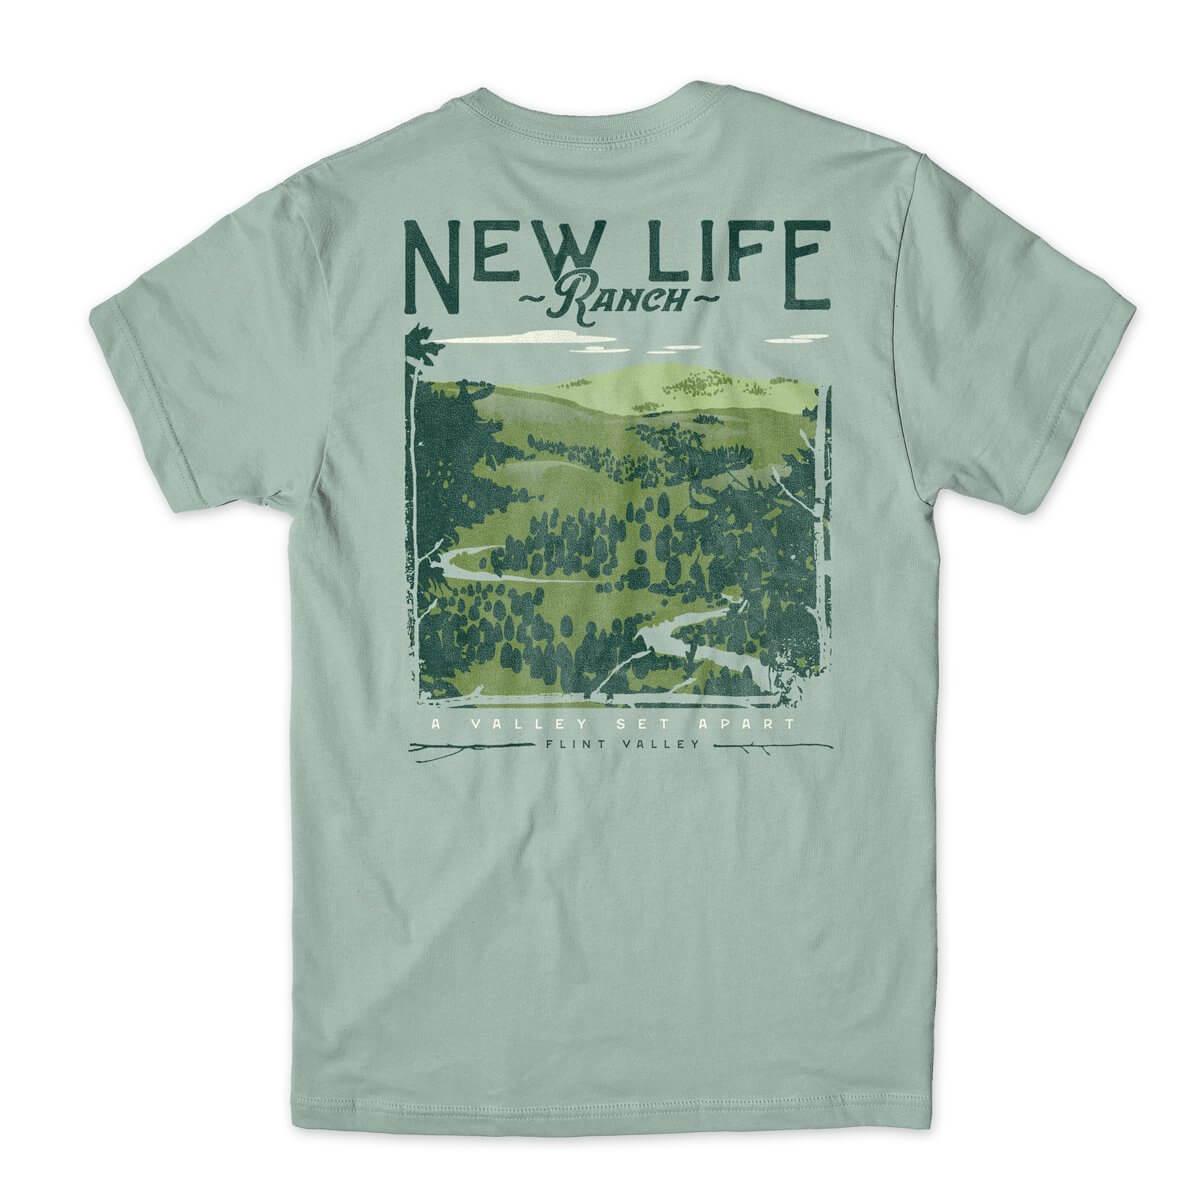 New Life Ranch Flint Valley t-shirt